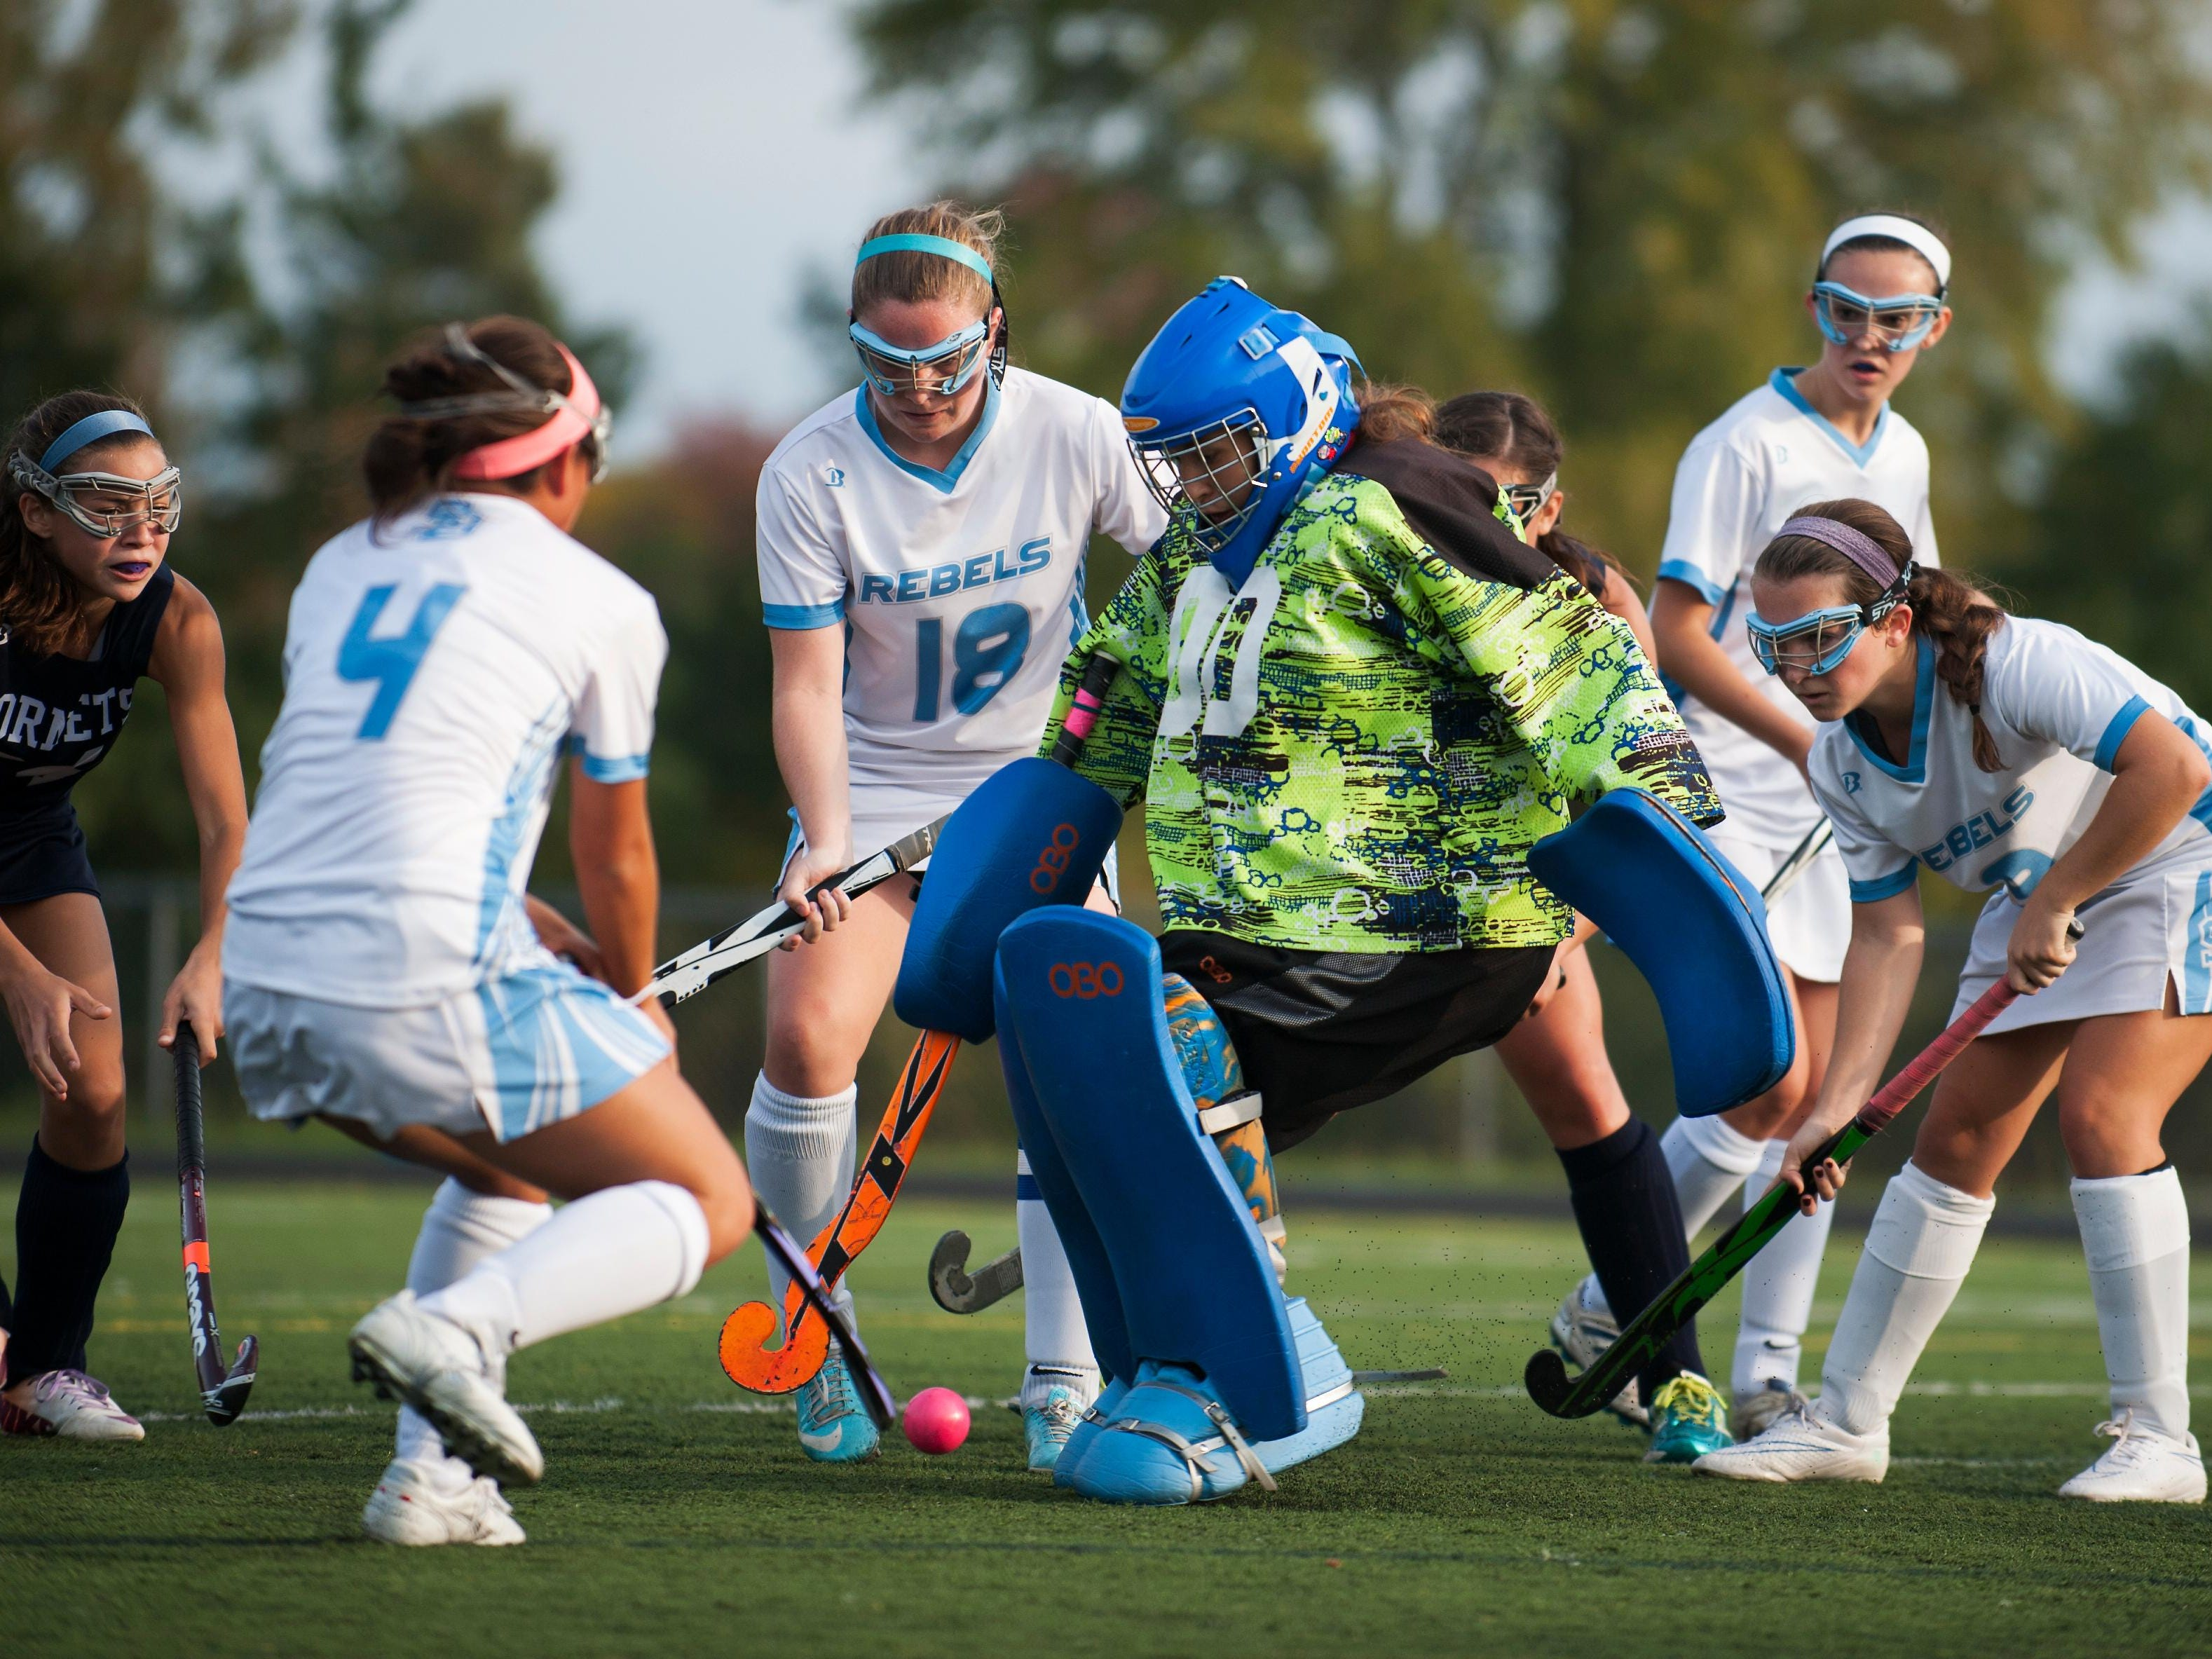 South Burlington goalie Liz Sargent (00) makes a save during a high school field hockey game last year.